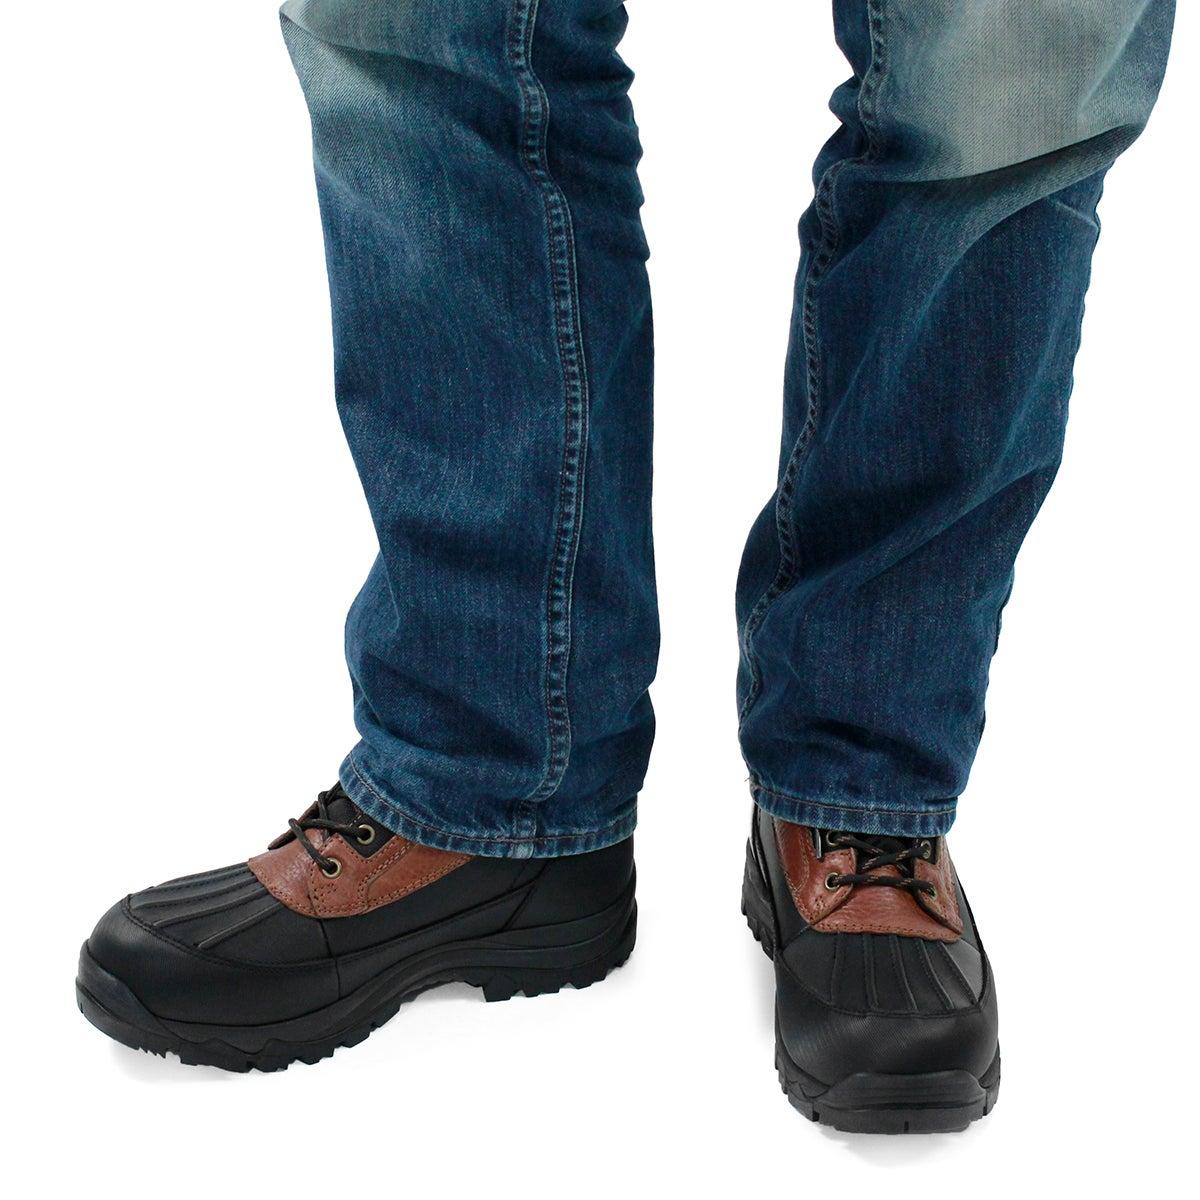 Mns Murphy brown wtpf winter boot